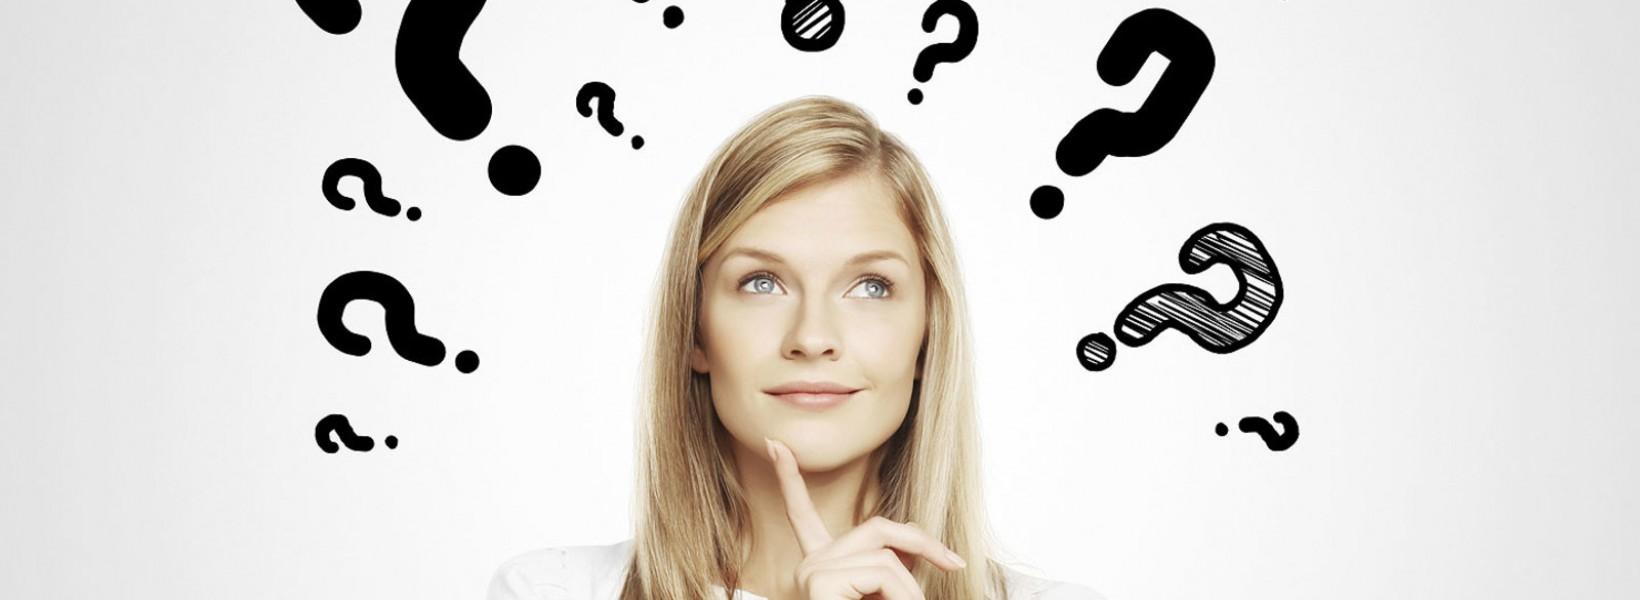 5 características importantes para elegir tu copa menstrual